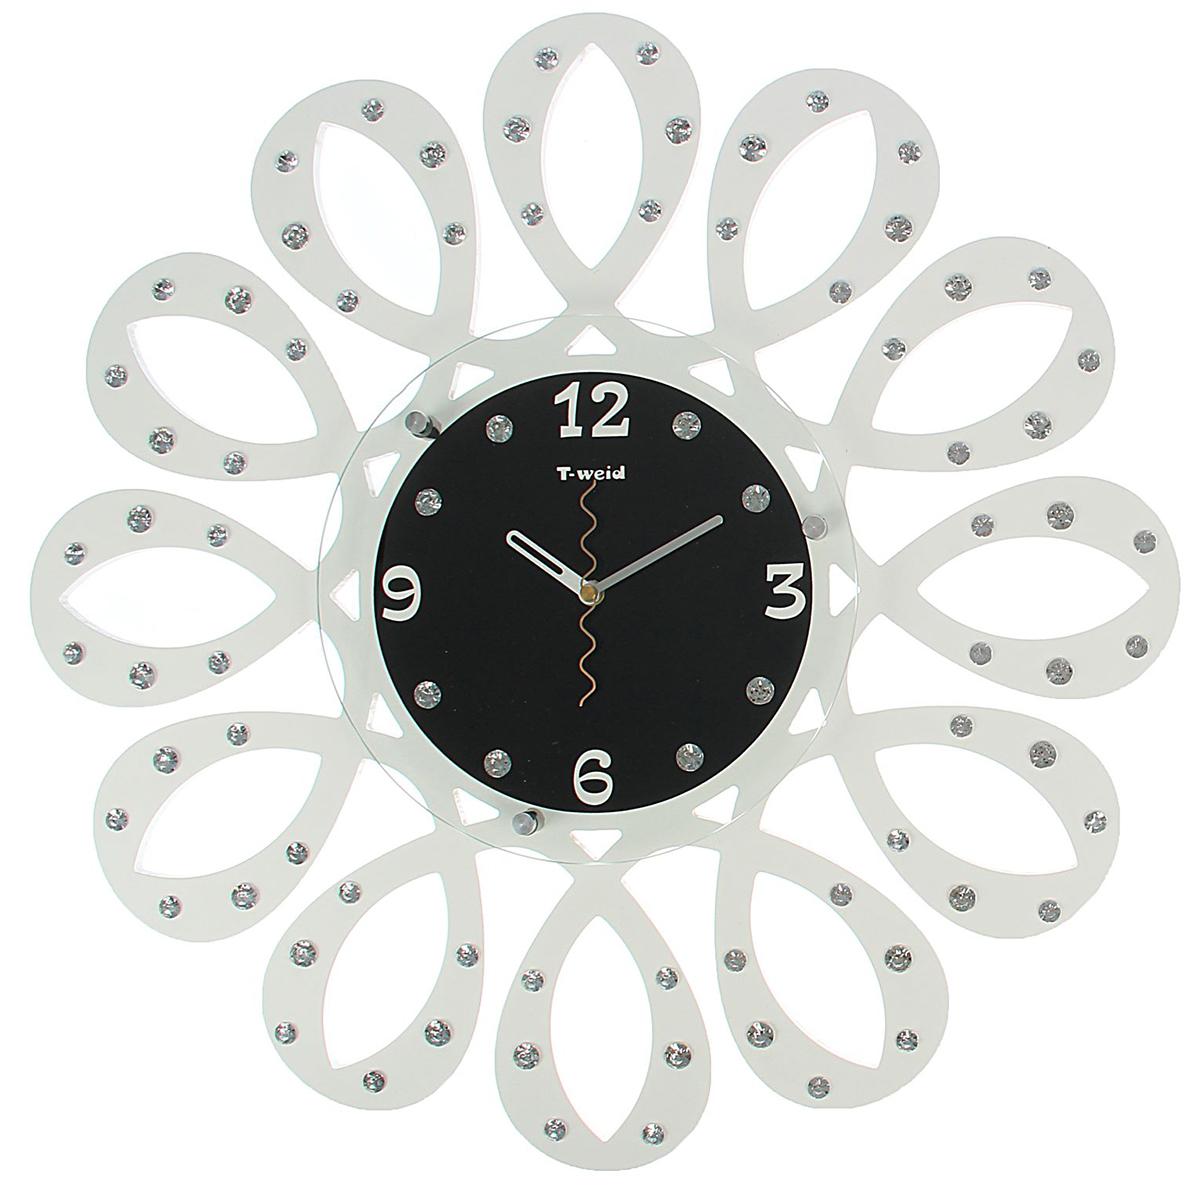 Часы настенные T-Weid Катрин, диаметр 52 см. 1717883 часы настенные t weid с фоторамками цвет белый 35 х 60 х 5 см